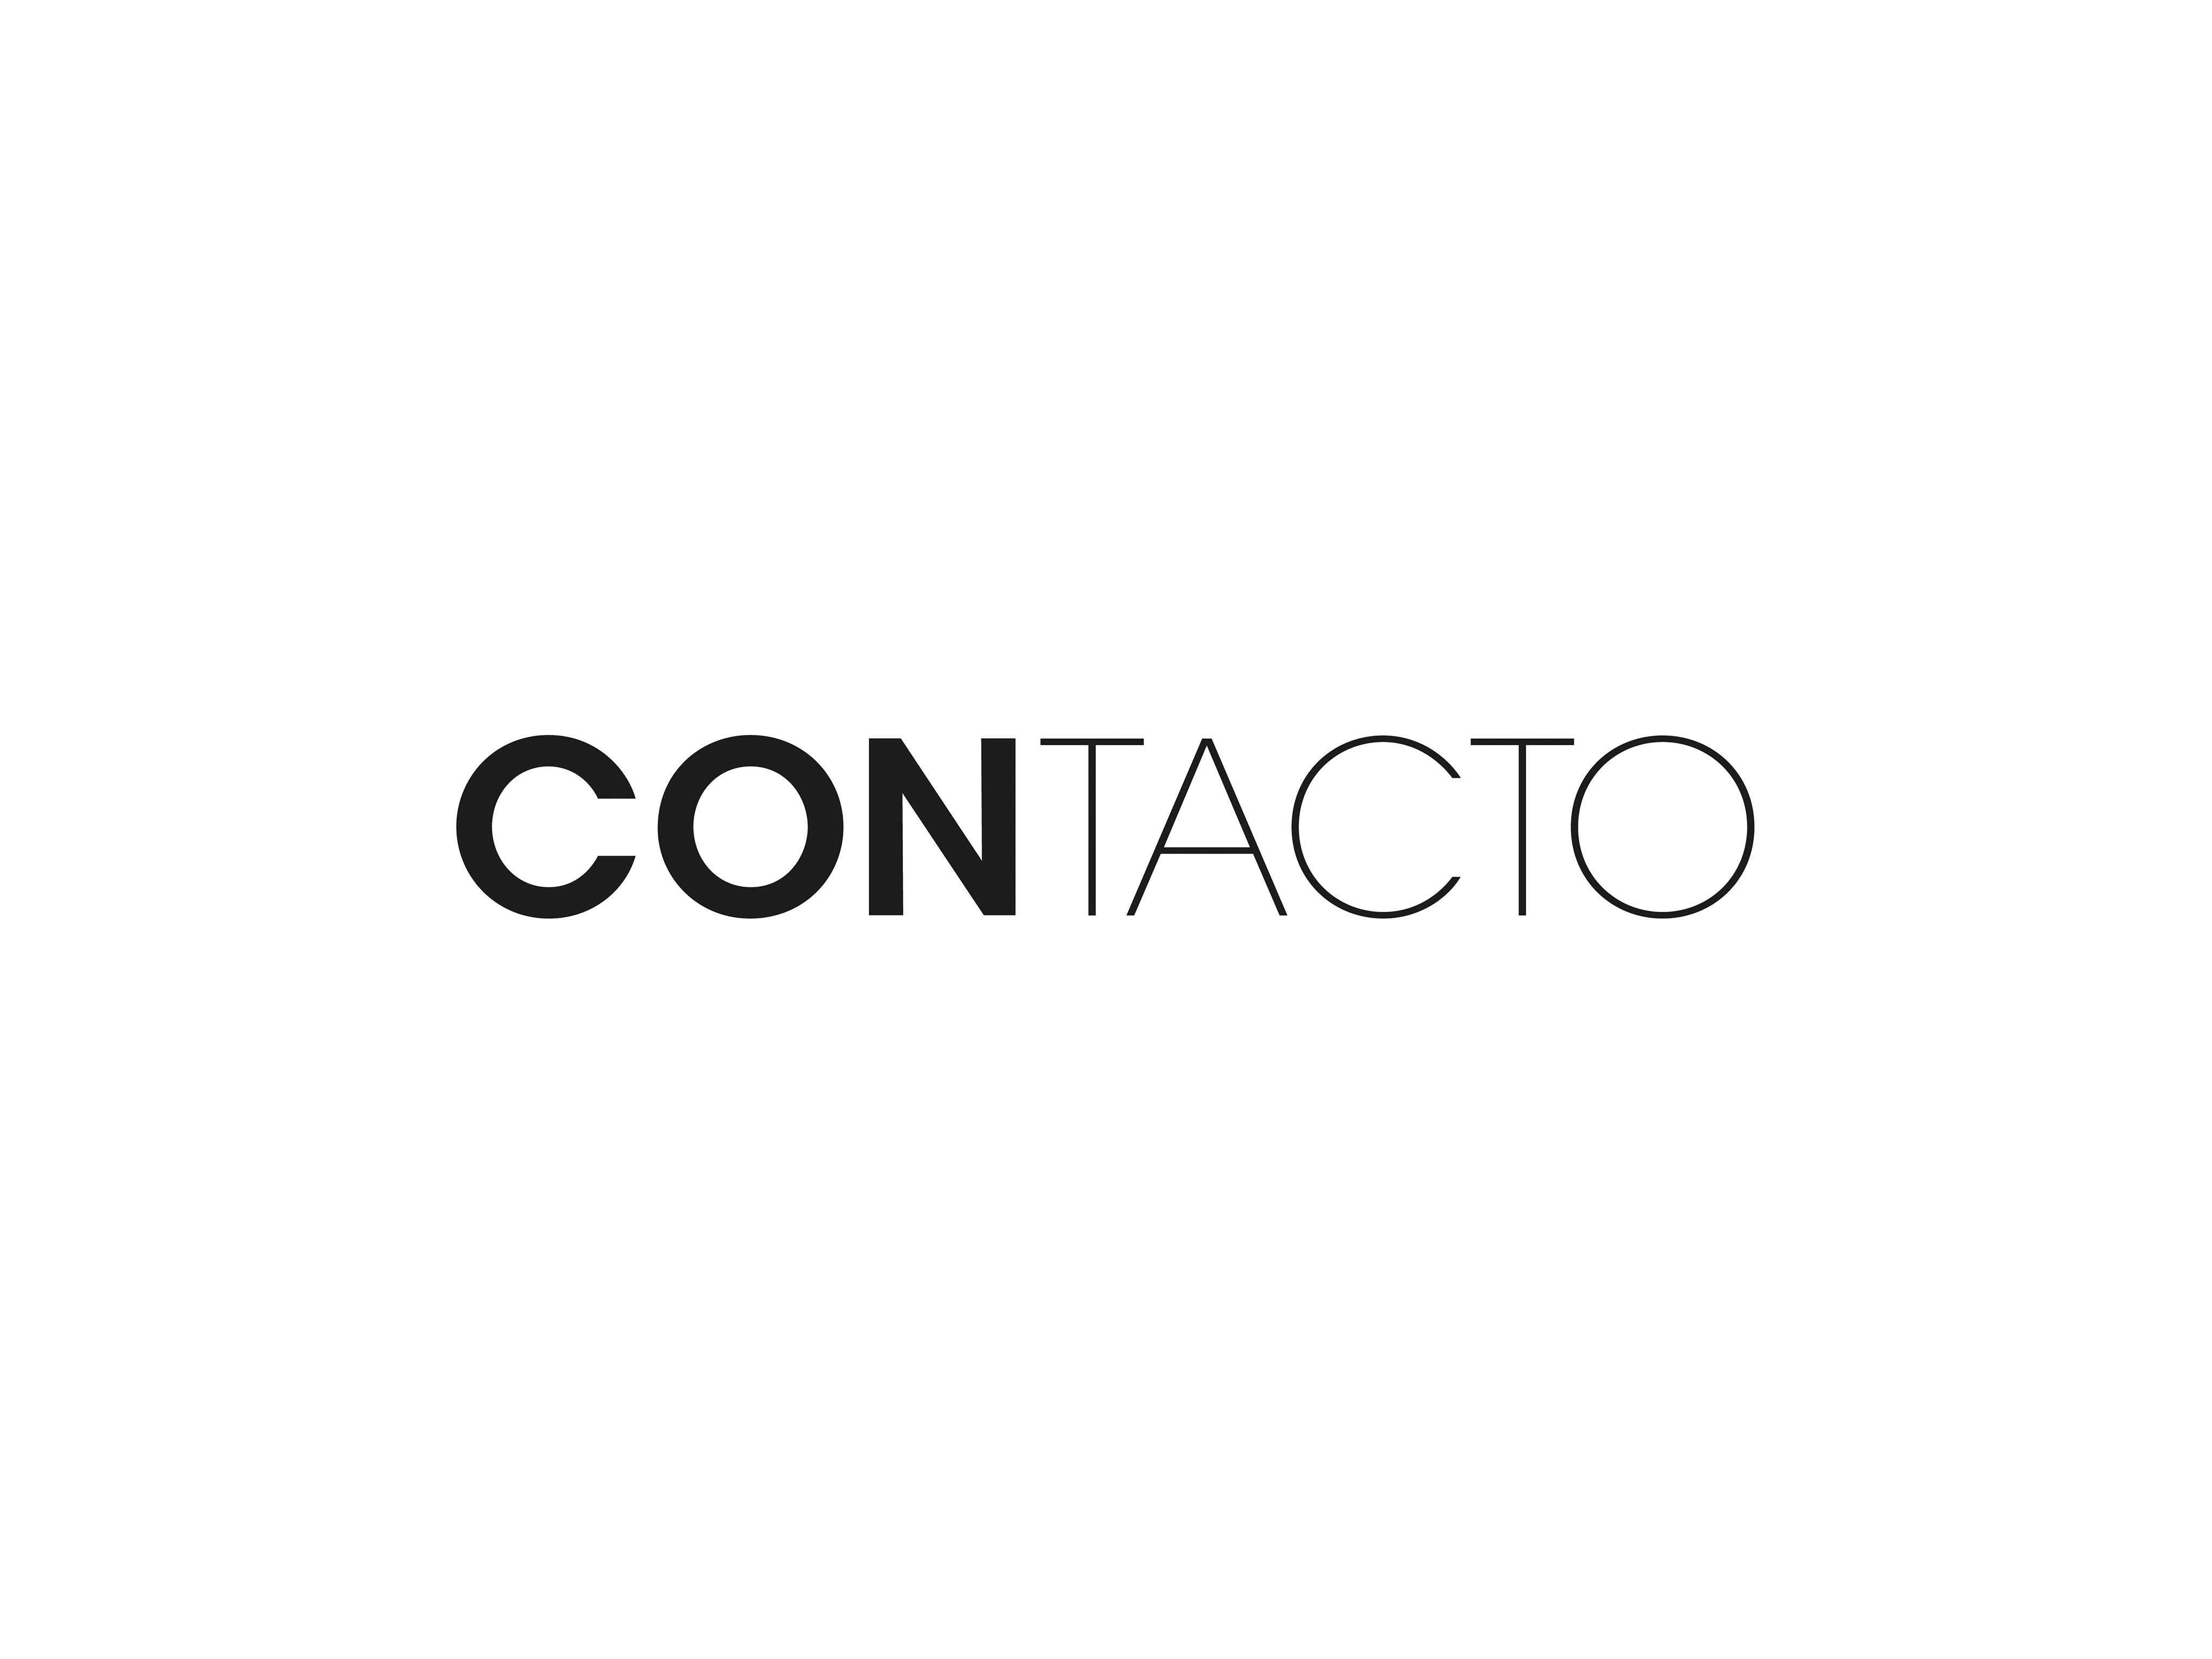 PREMIO-ANUARIA-DISEÑO-NAMING-CONTACTO-ROBERTO-NUÑEZ